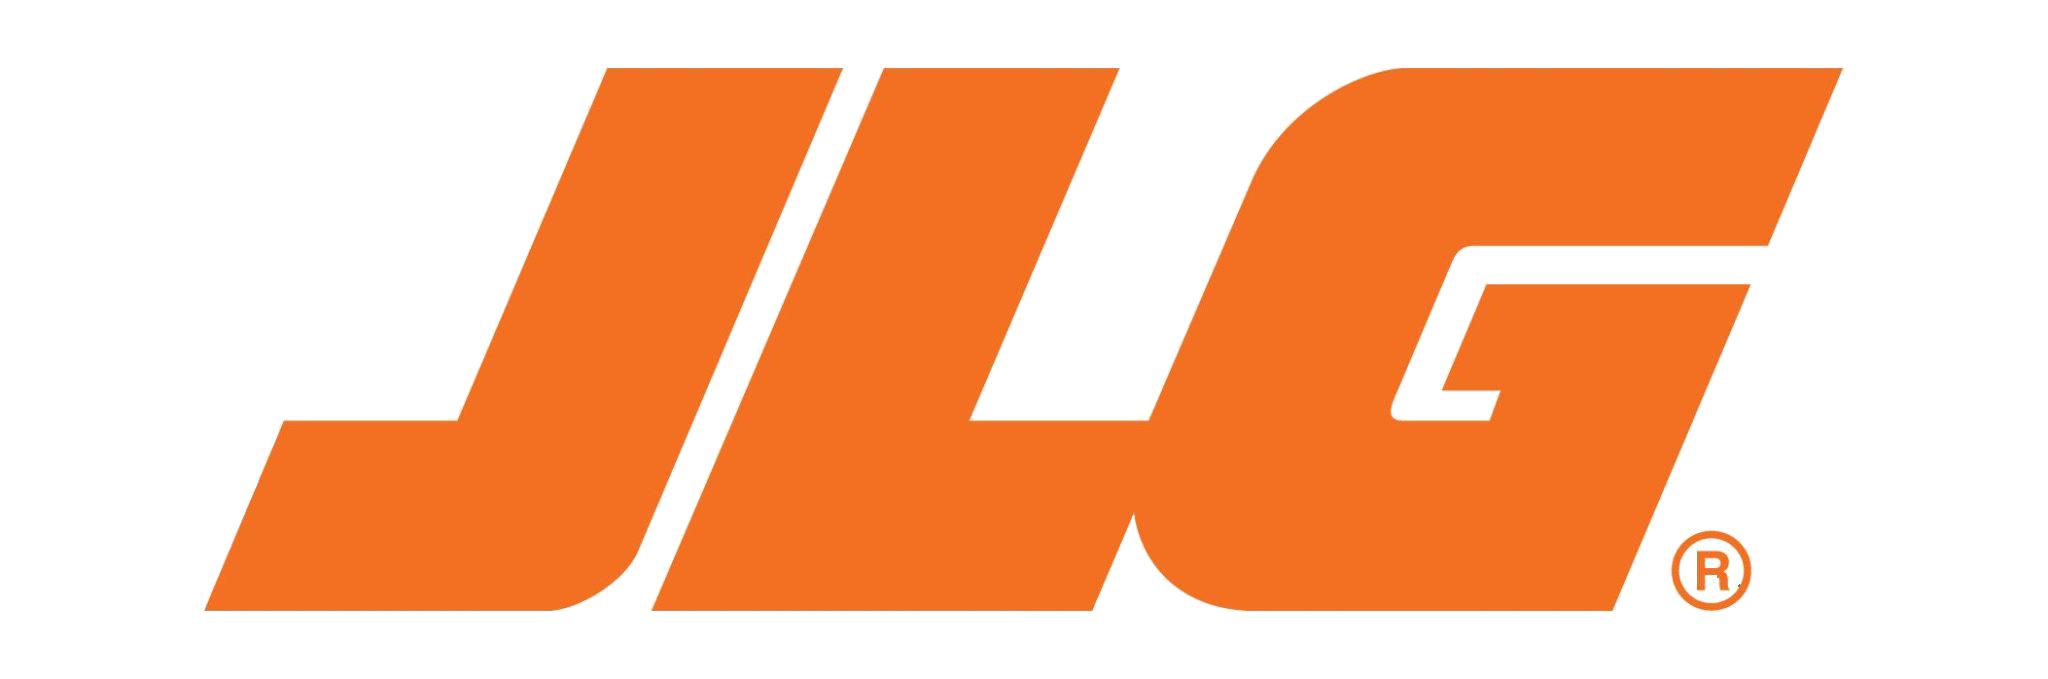 2 - JLG brand